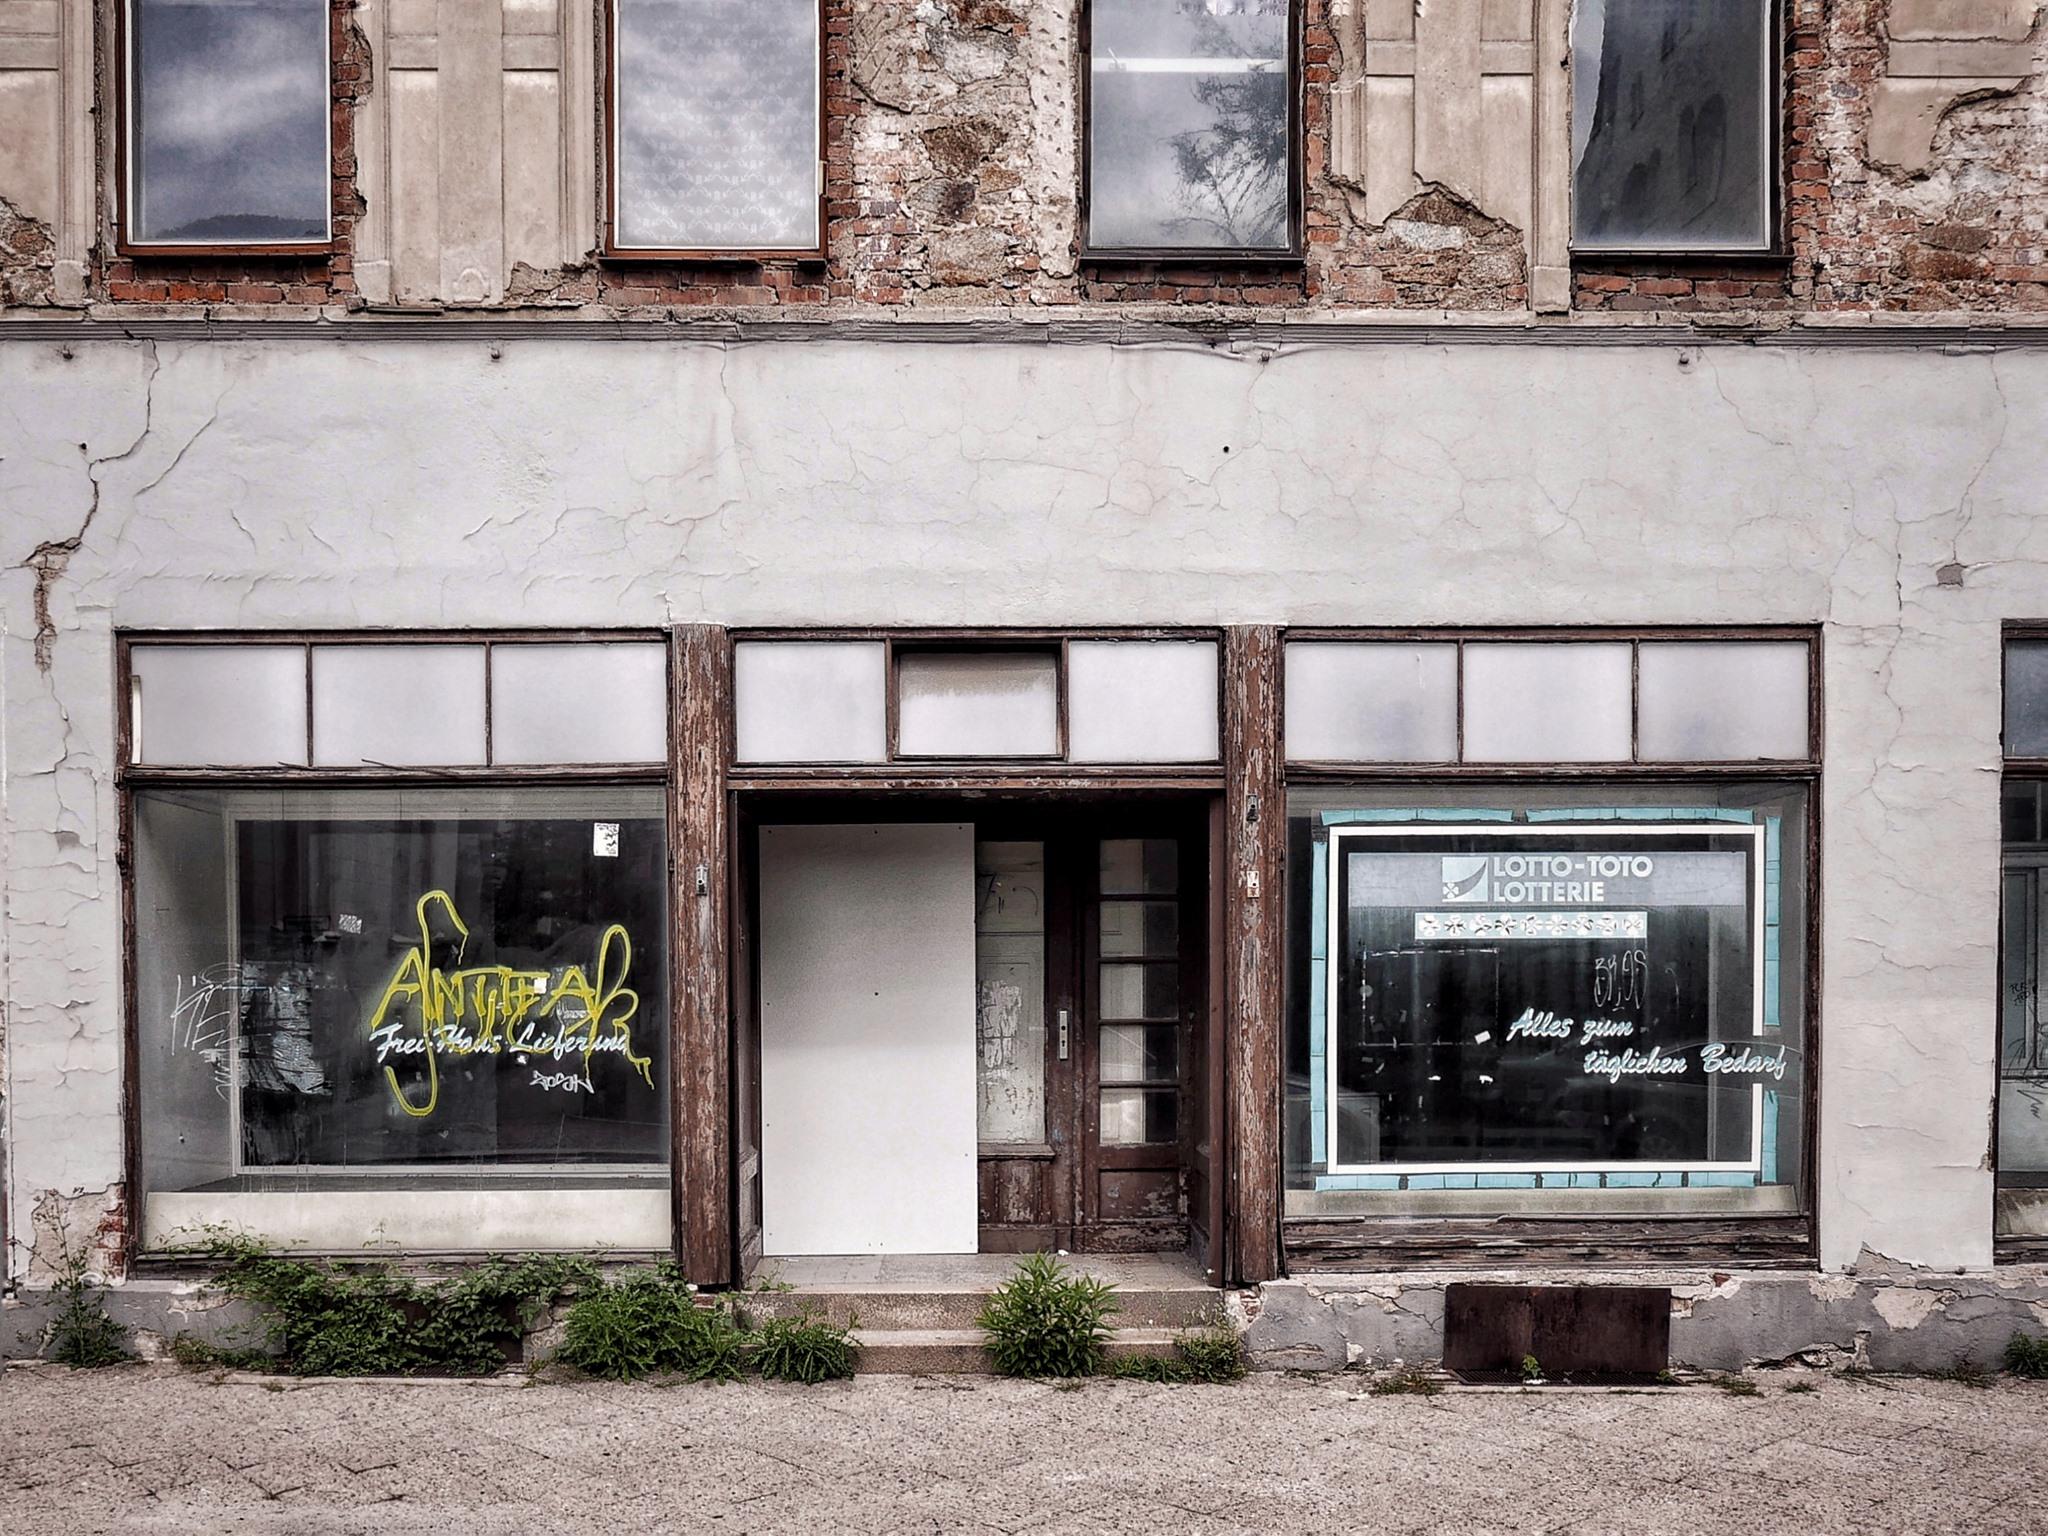 Görlitz, Sachsen, Germany |©Anne Seubert